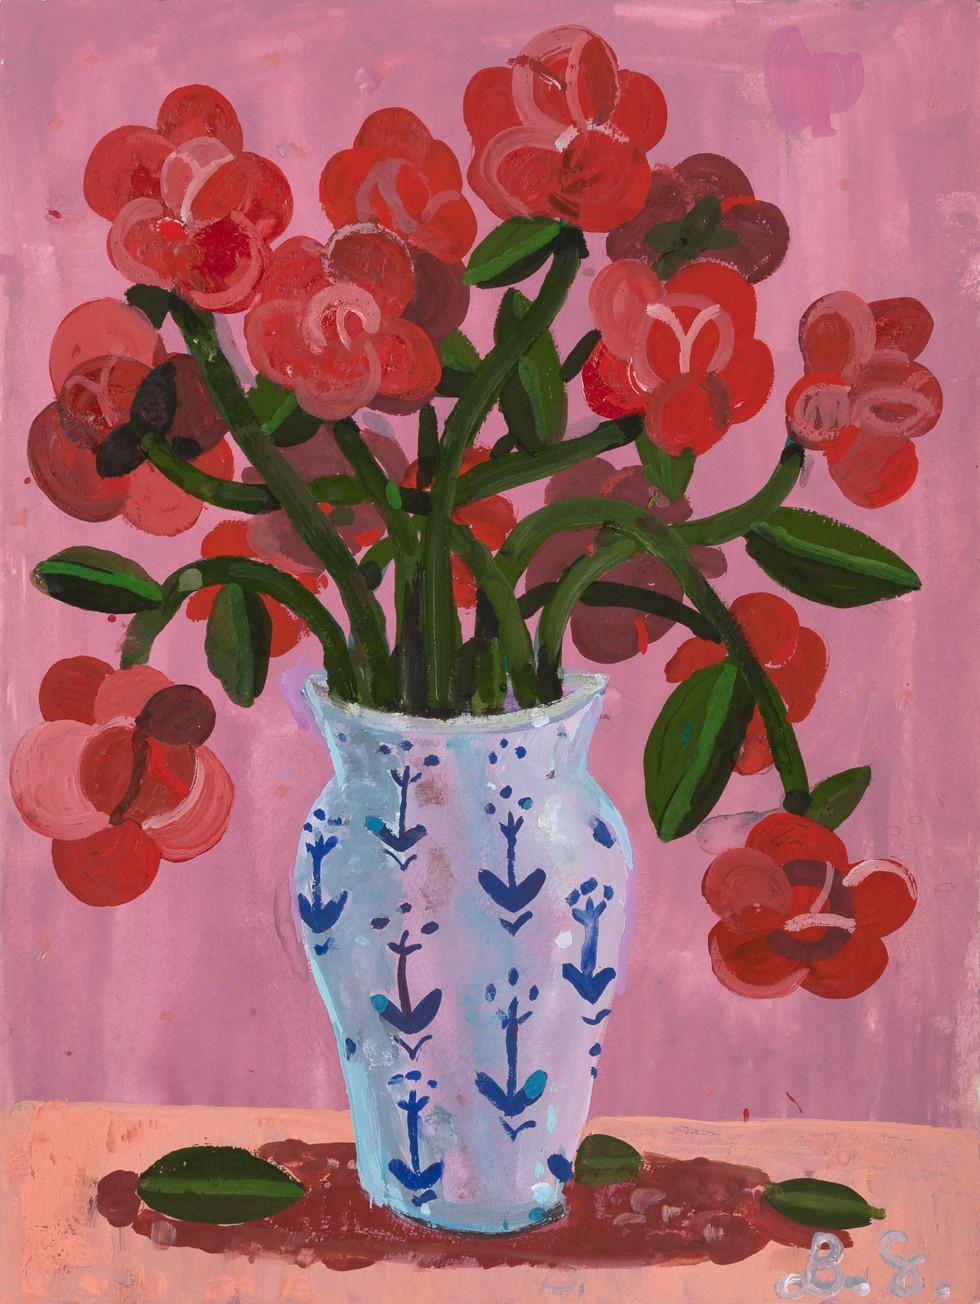 BEN SLEDSENS, Red Flowers in a Vase, 2018